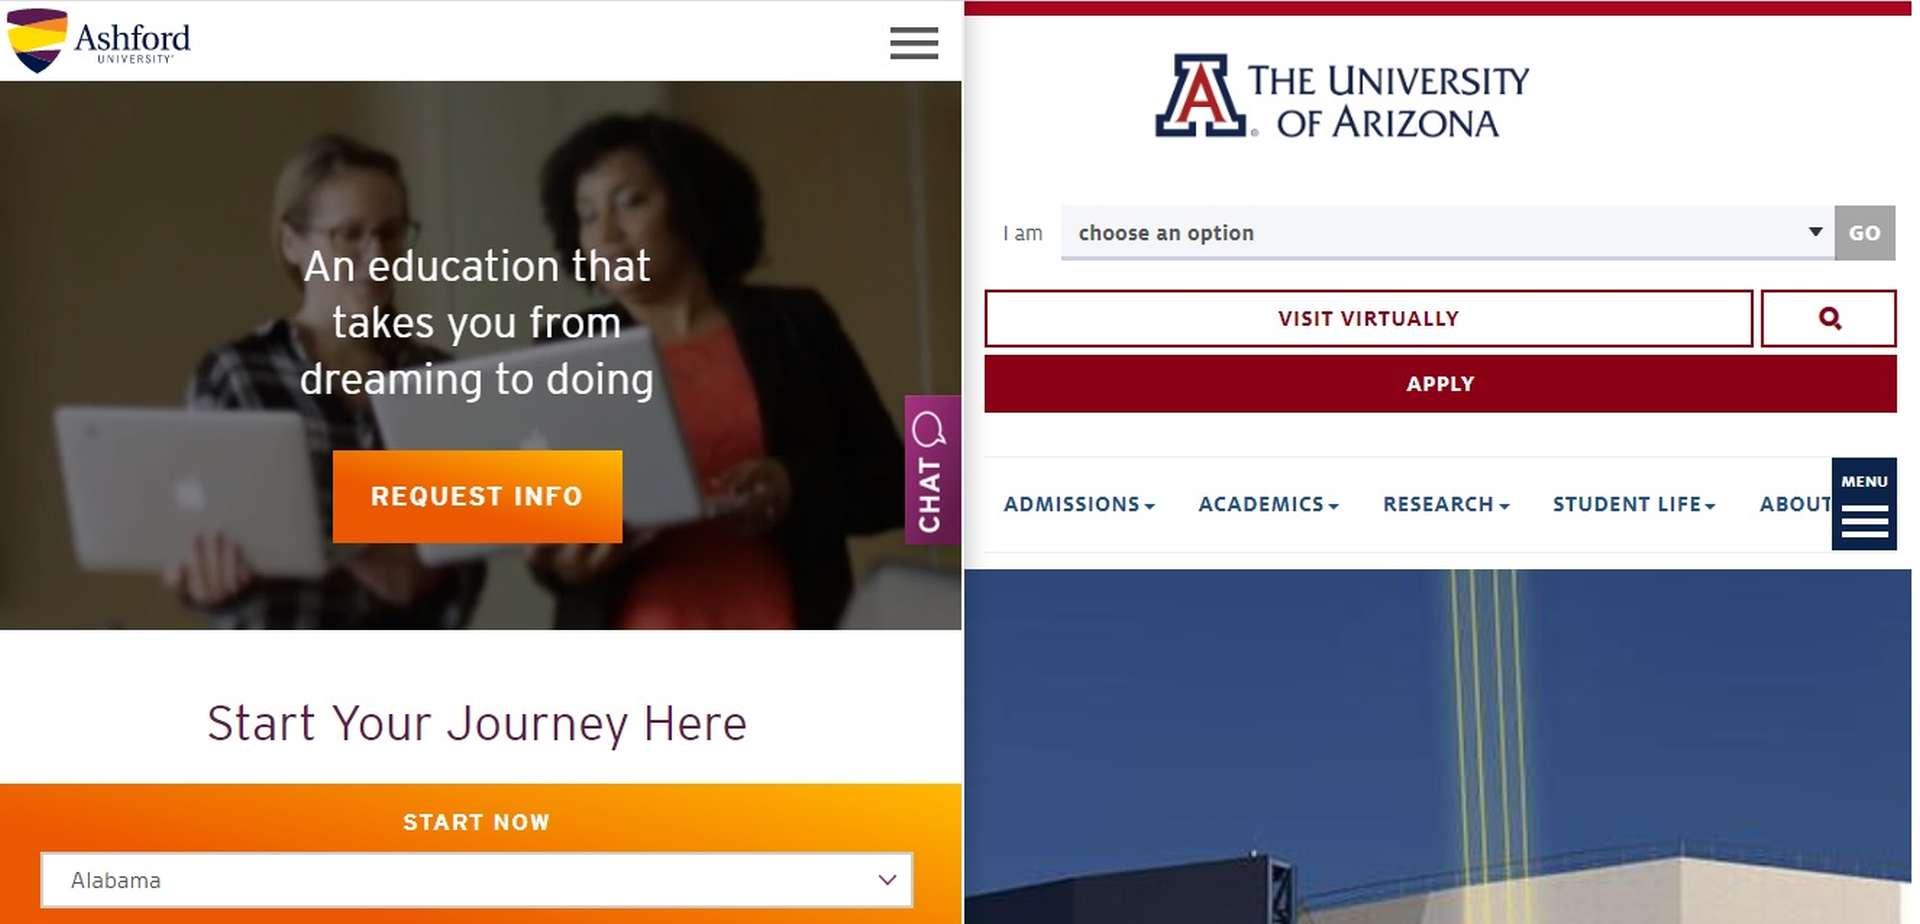 University of Arizona to acquire Ashford University